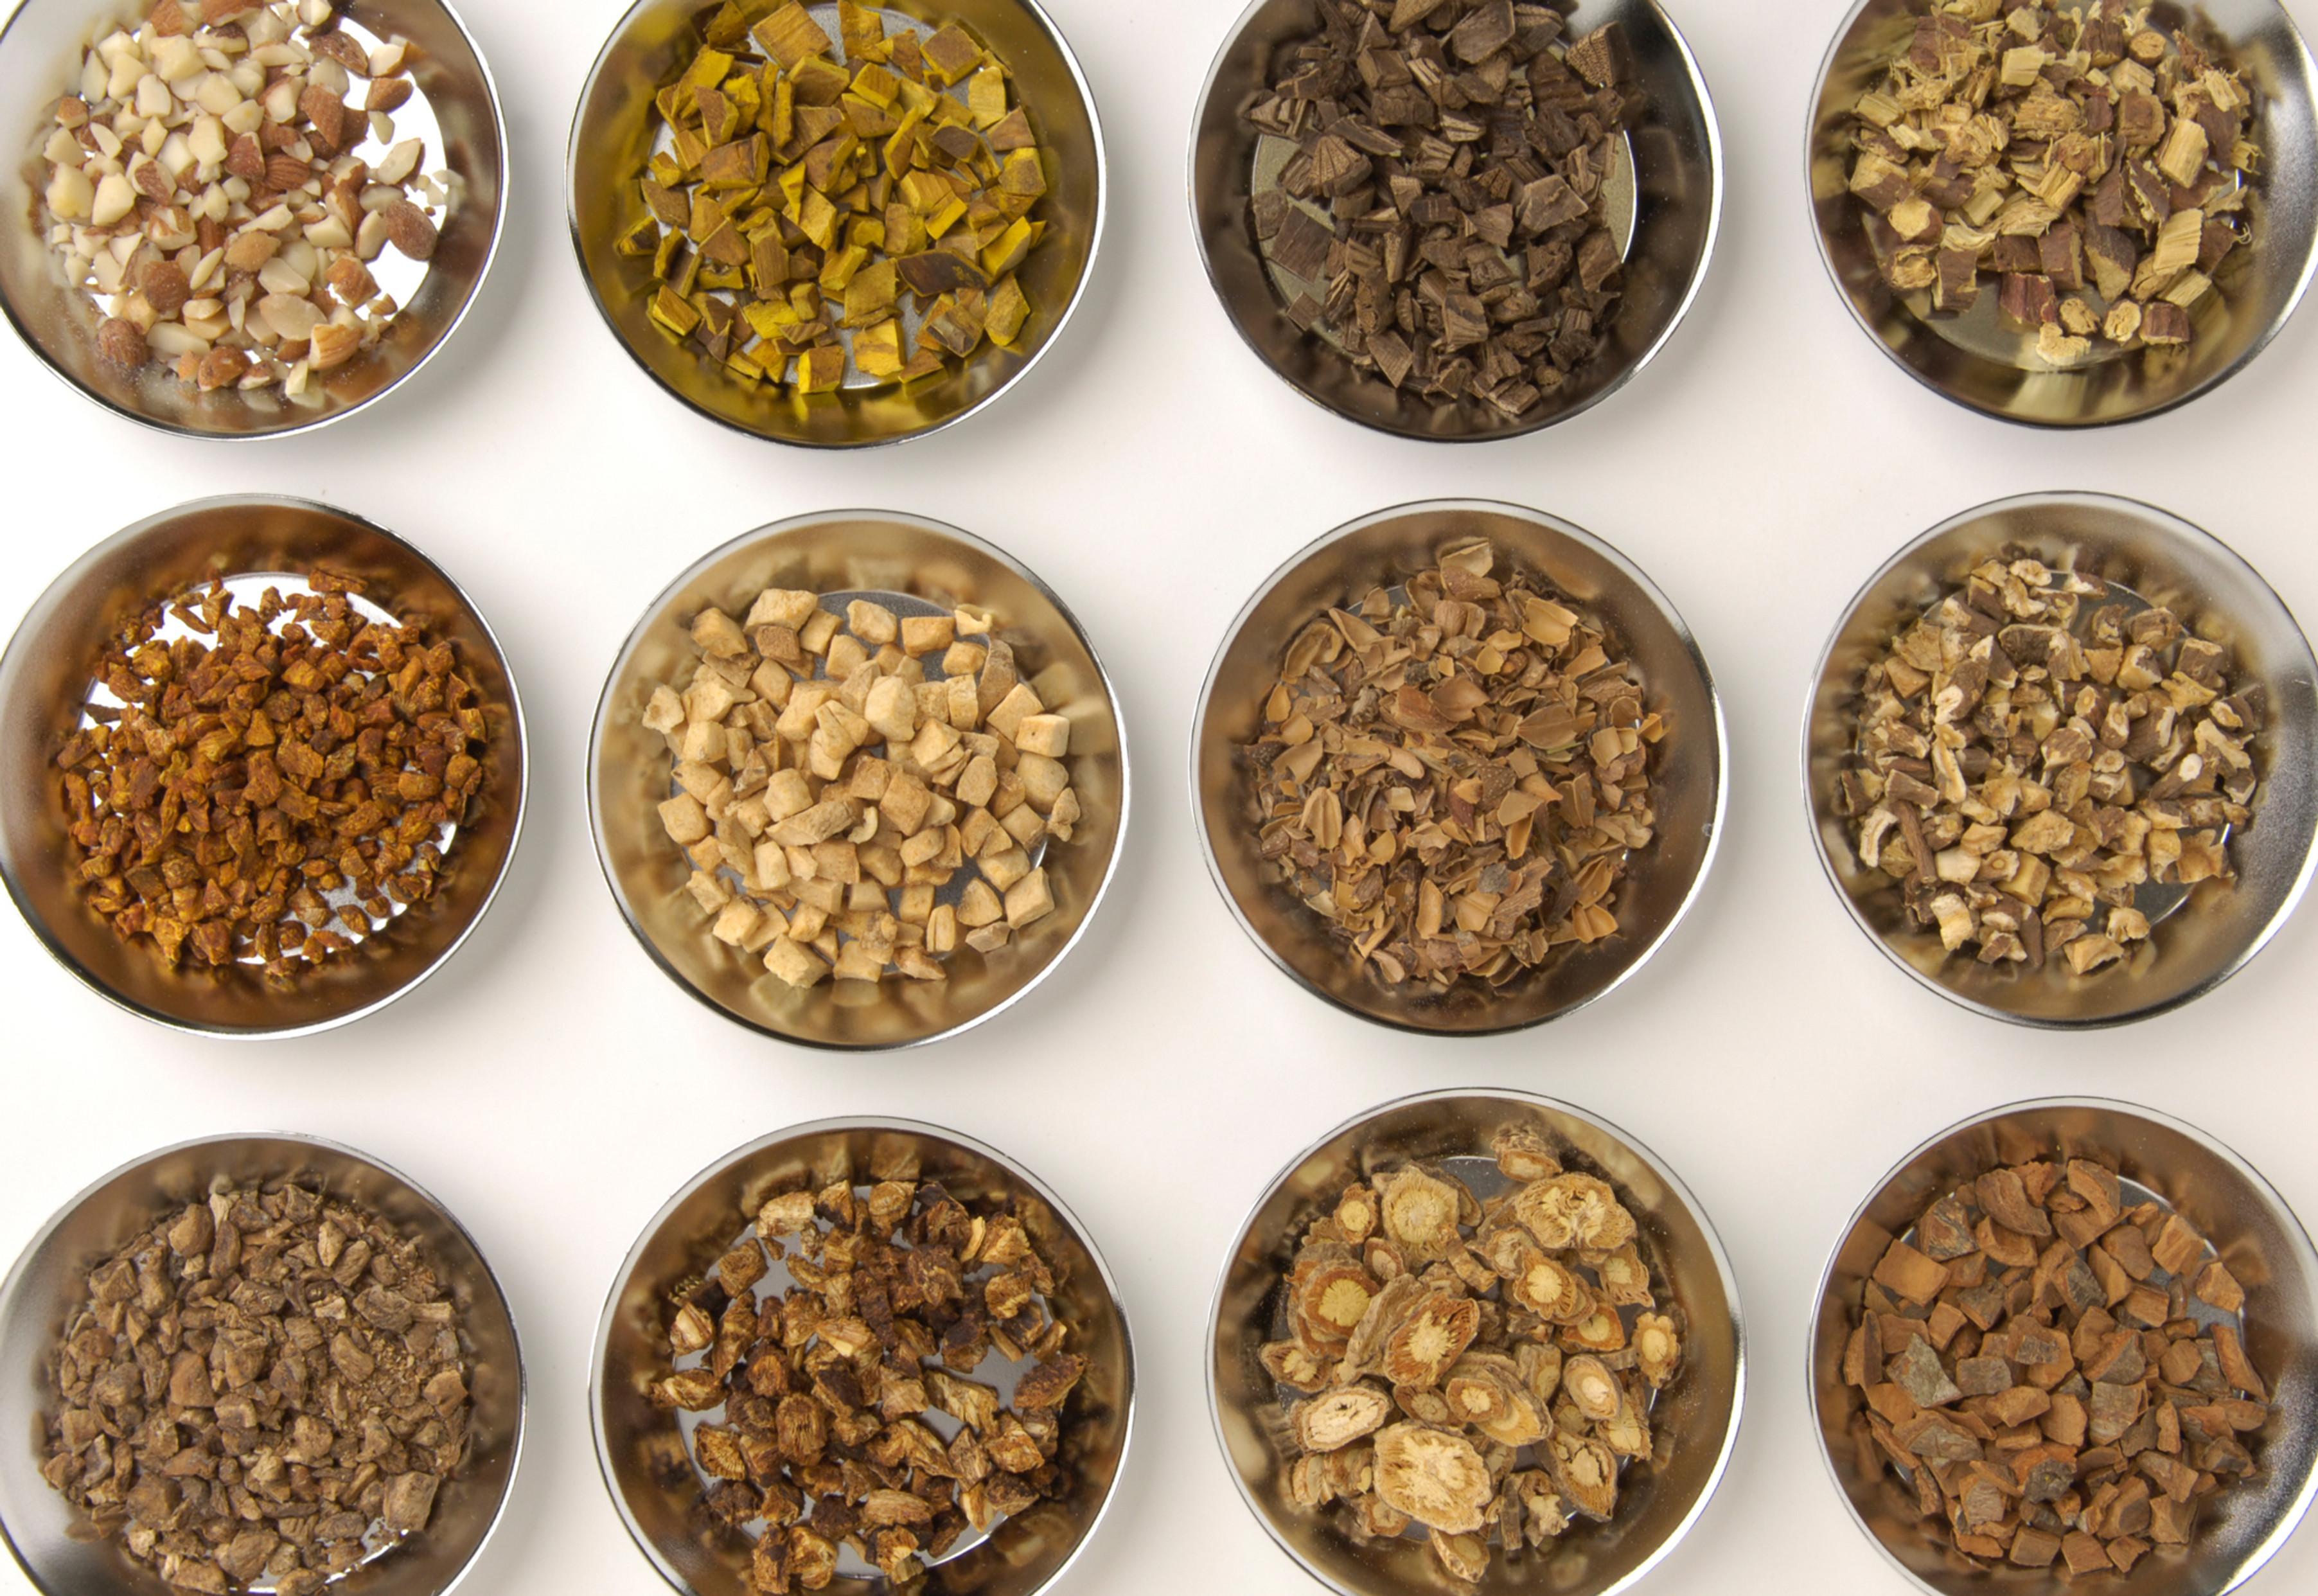 Initial Herbal Consultation